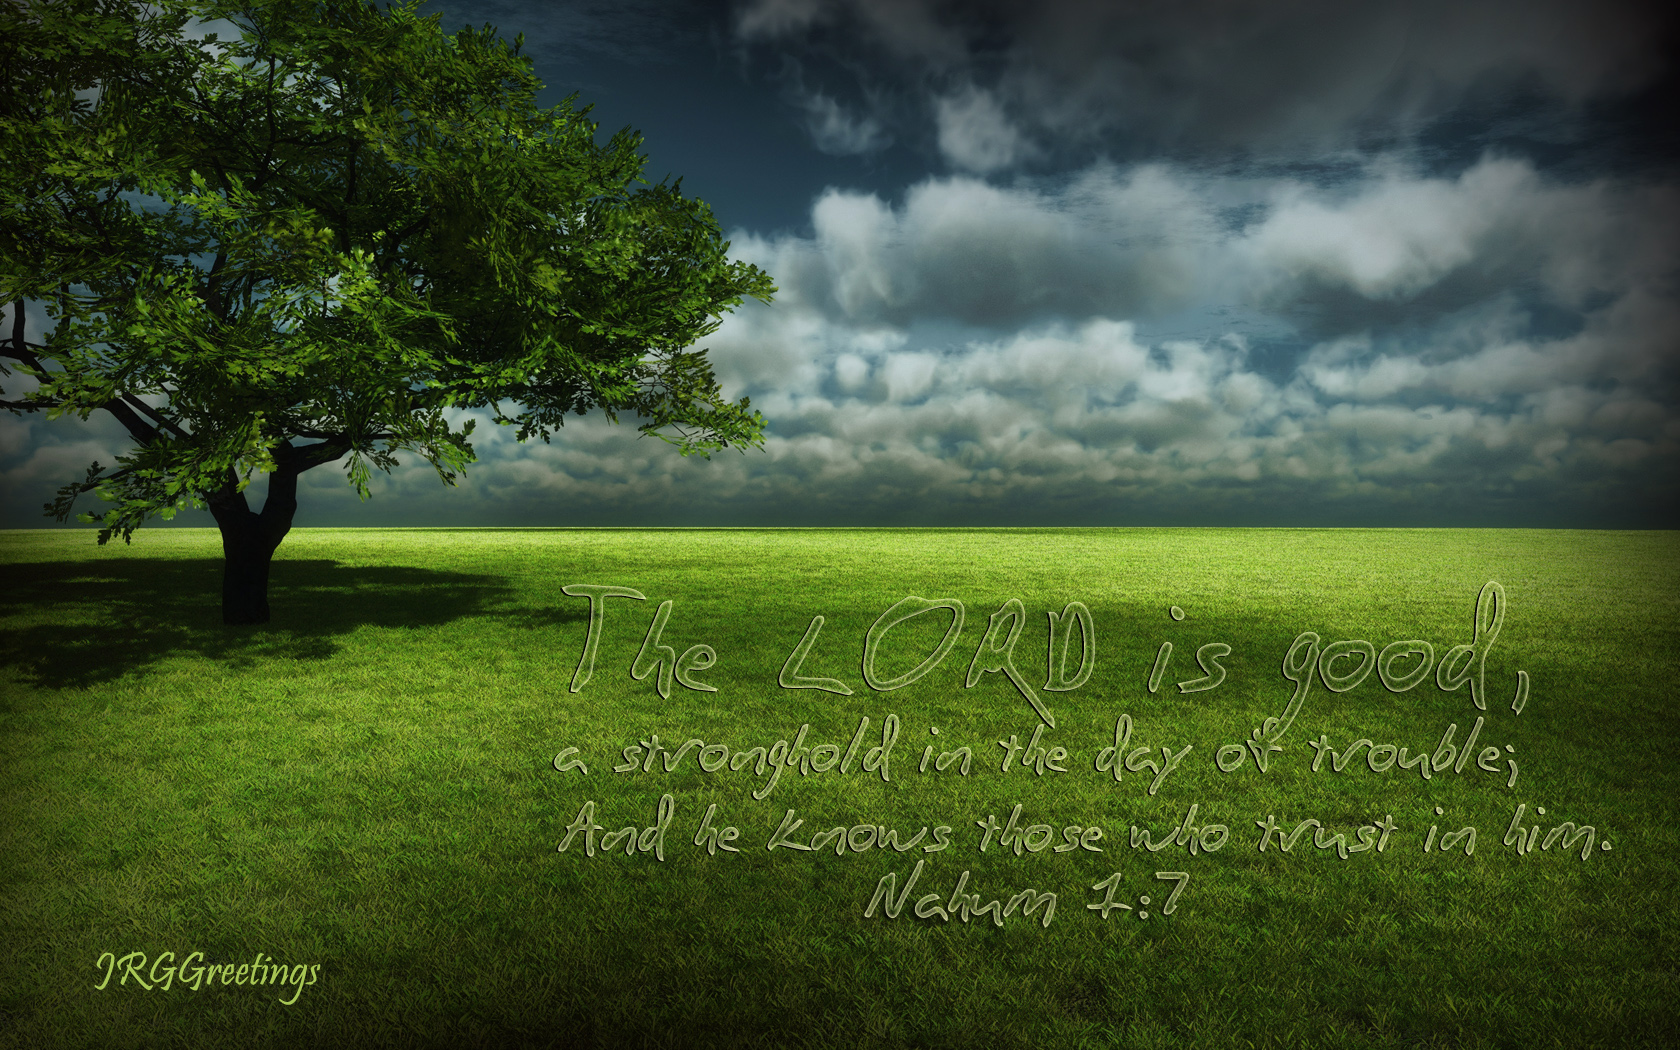 Hd wallpaper upload - Free Download Hq Christian Wallpaper Wallpaper Num 14 1680 X 1050 1